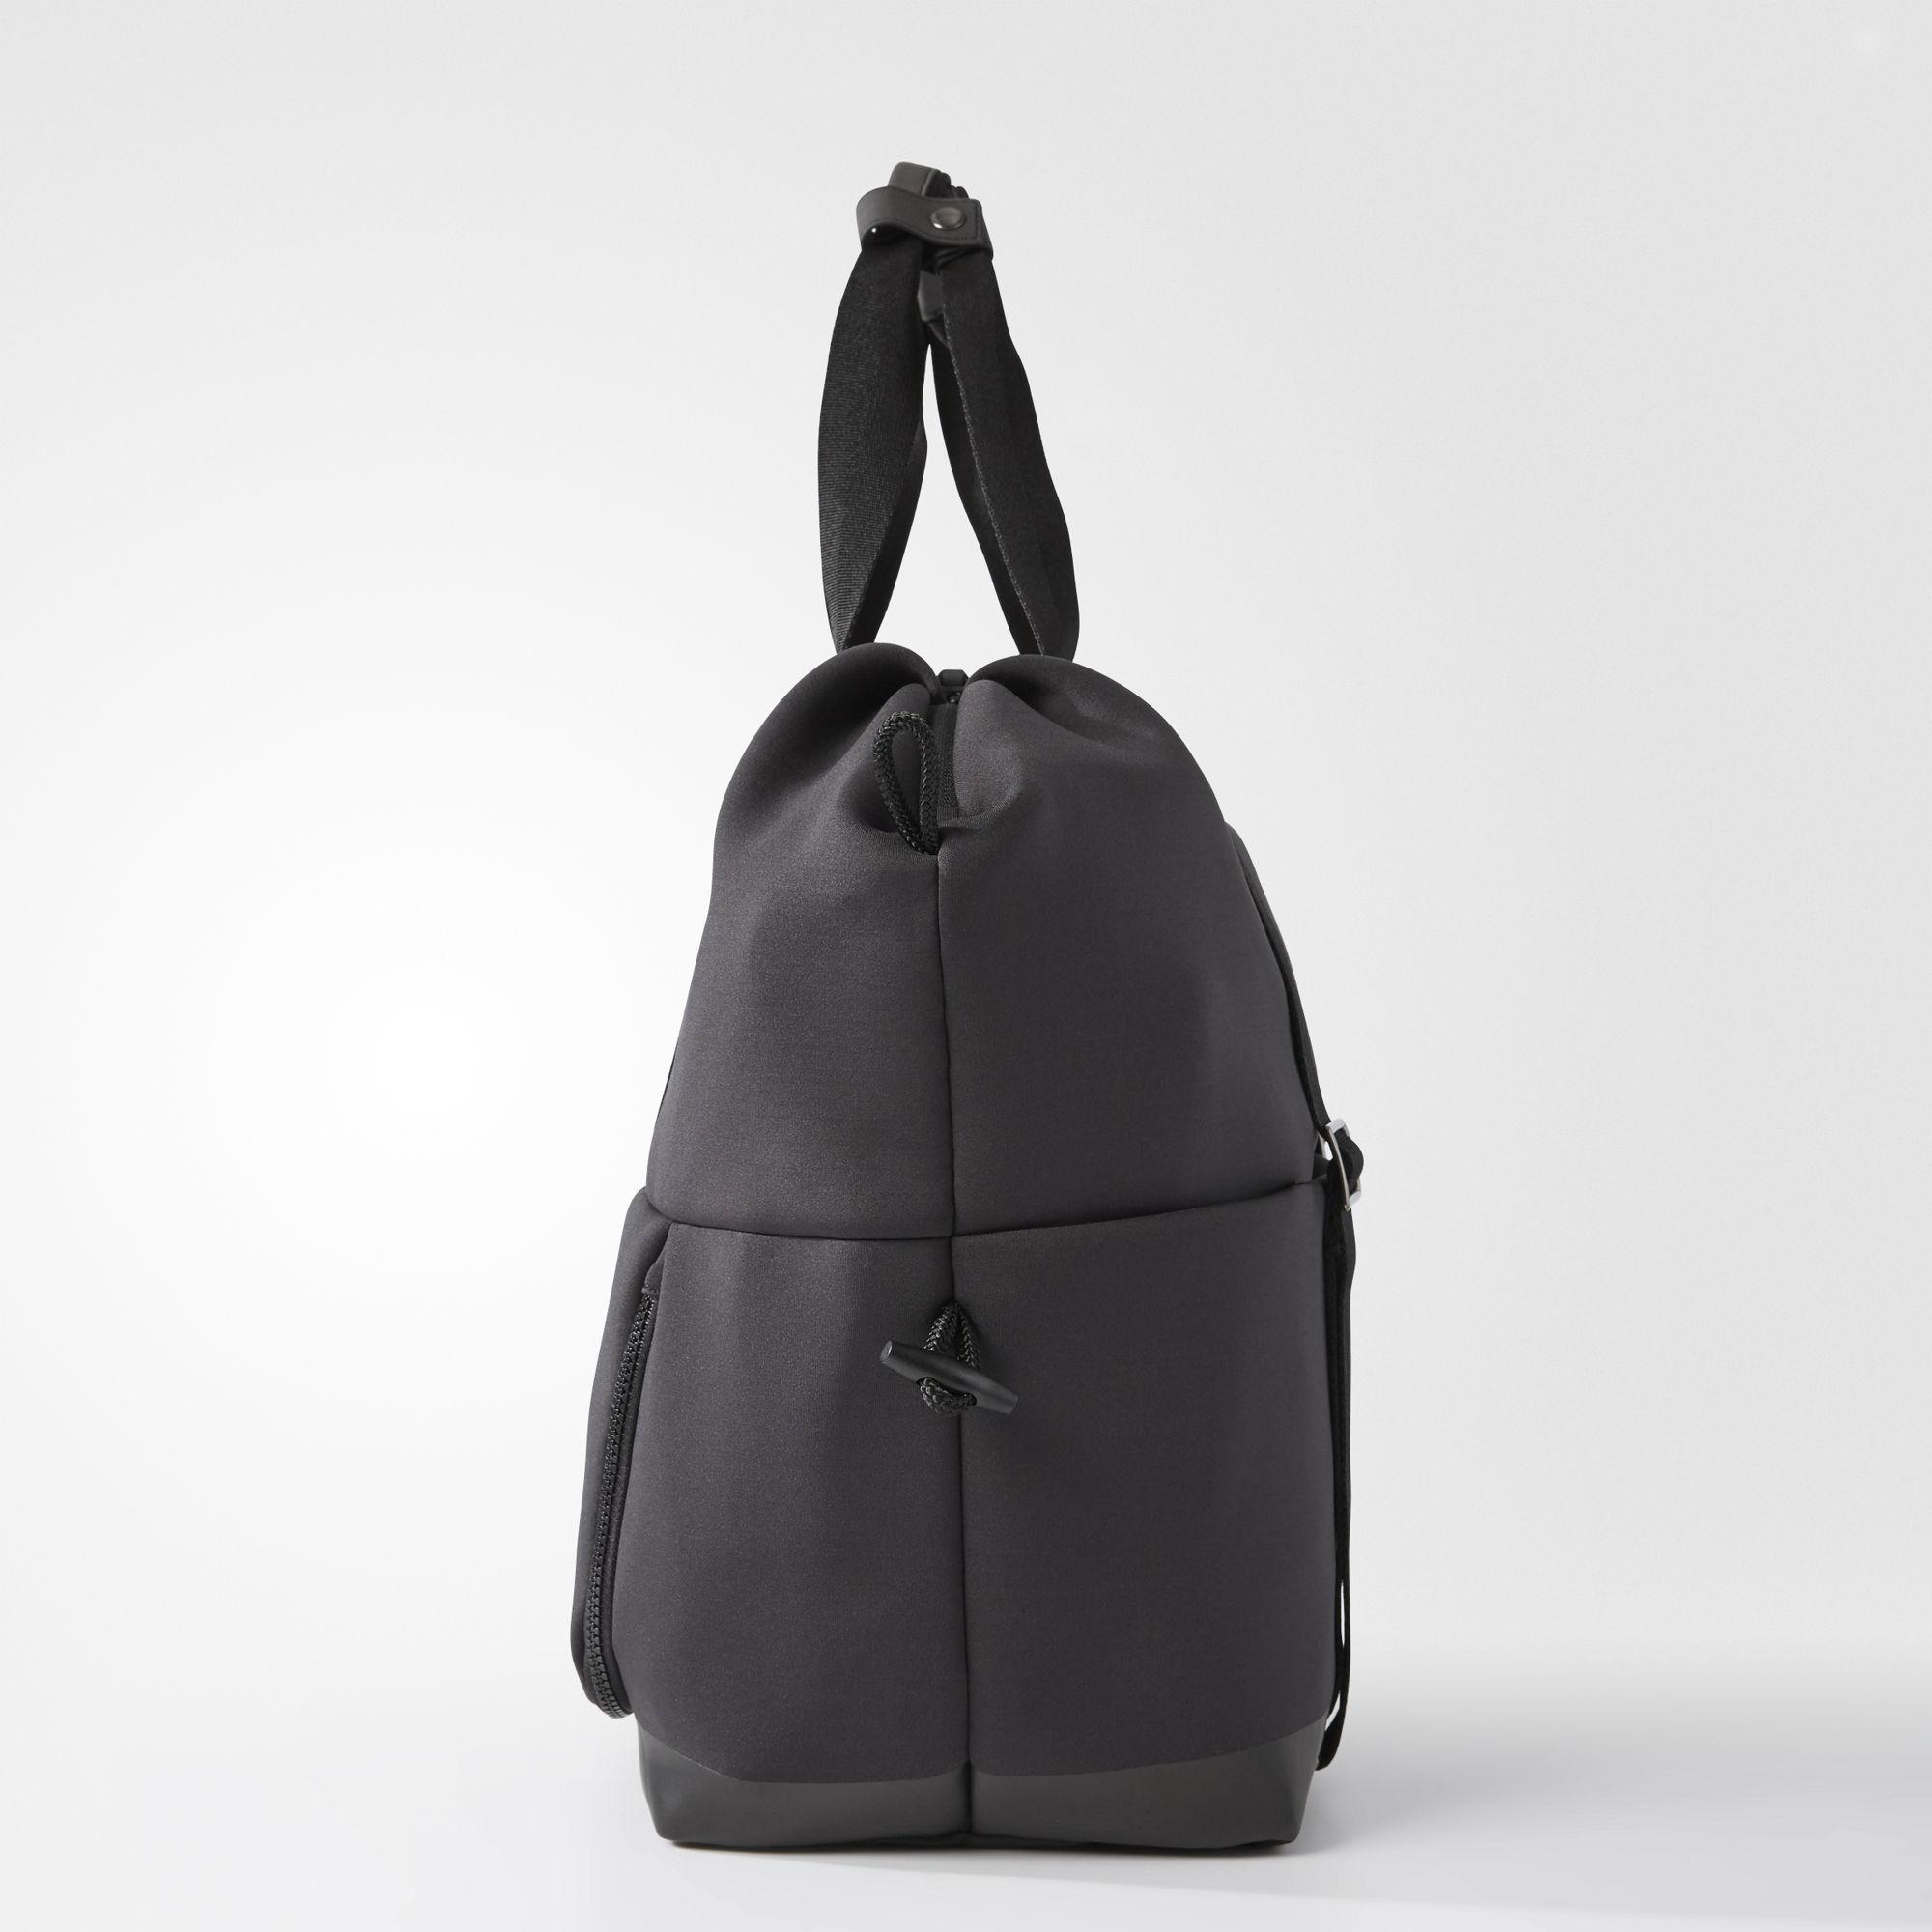 f38381f0fe5 Lyst - adidas Favorite Tote Bag in Black